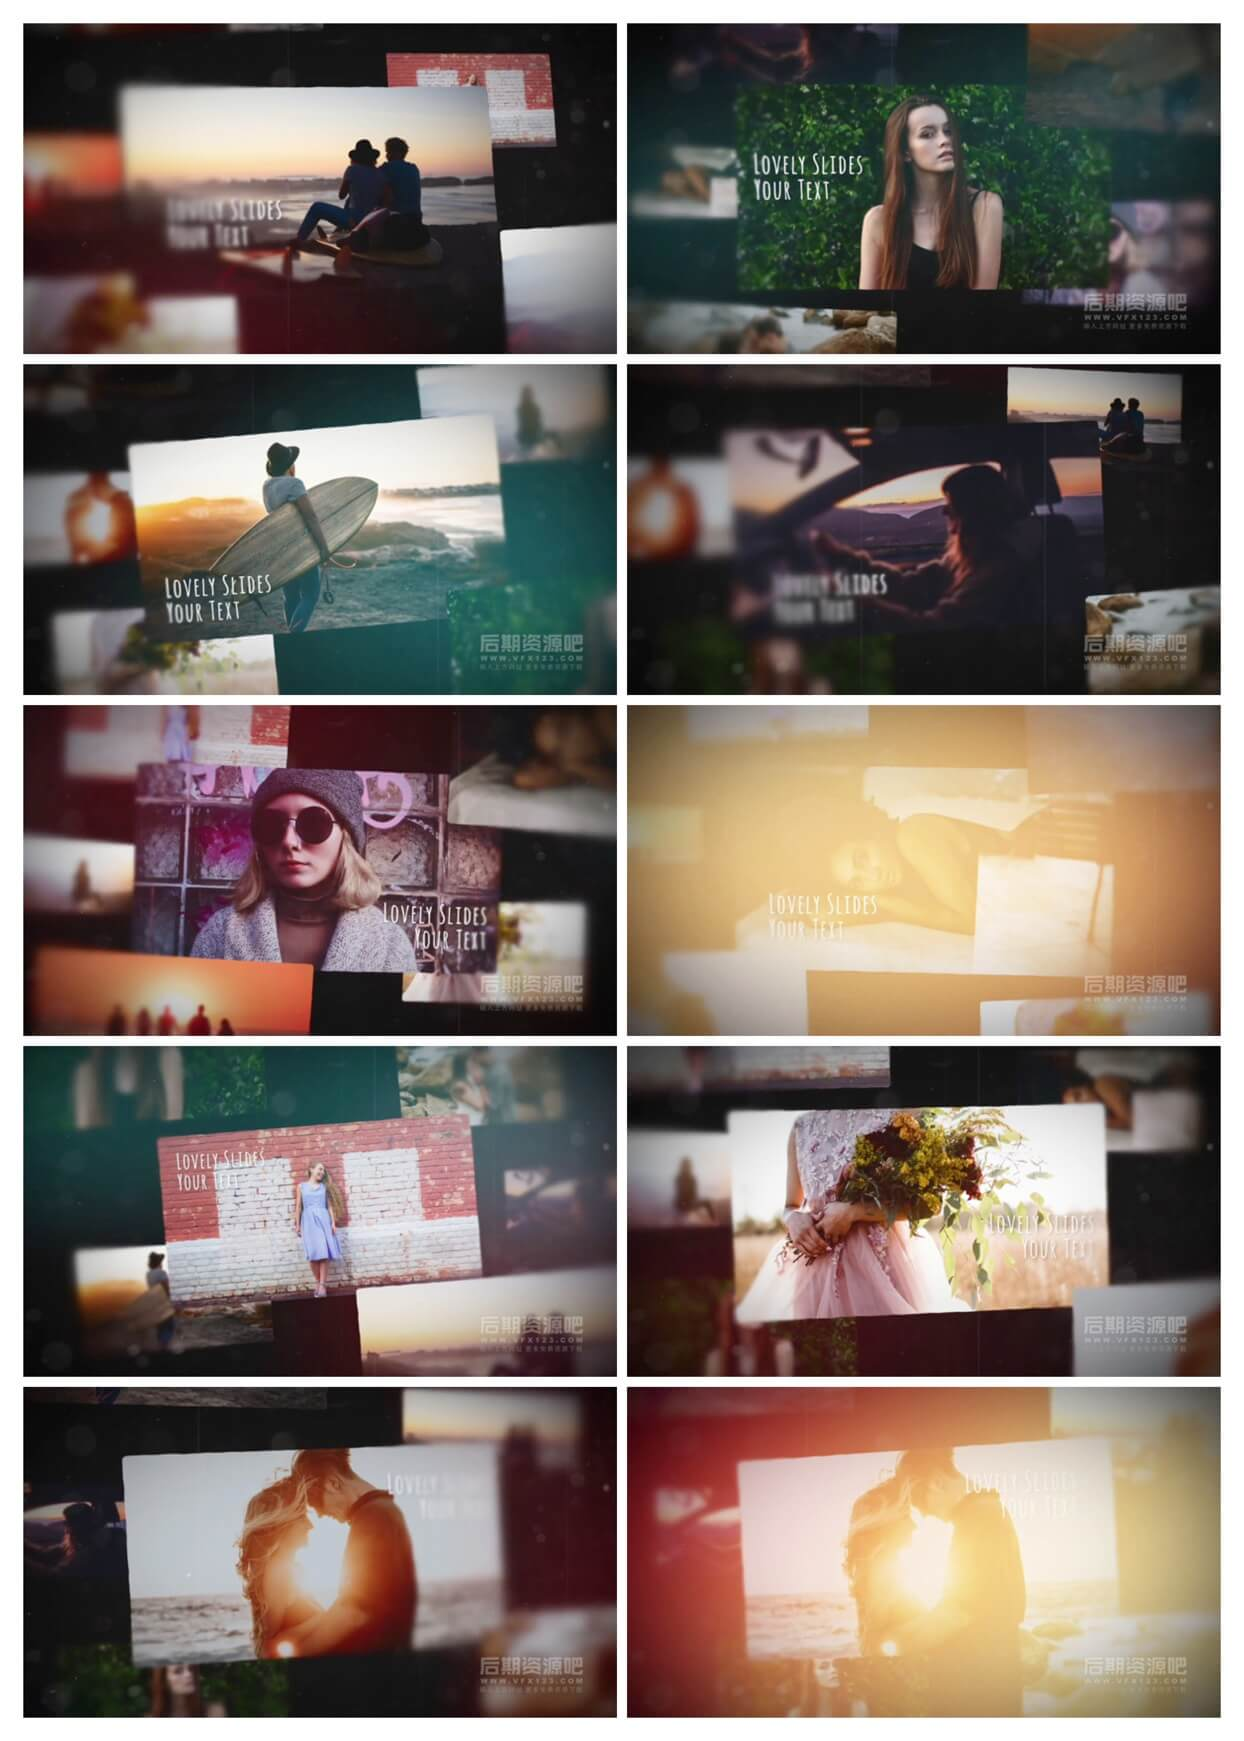 fcpx插件 时尚爱情婚礼MV电子相册展示模板 Lovely Slides